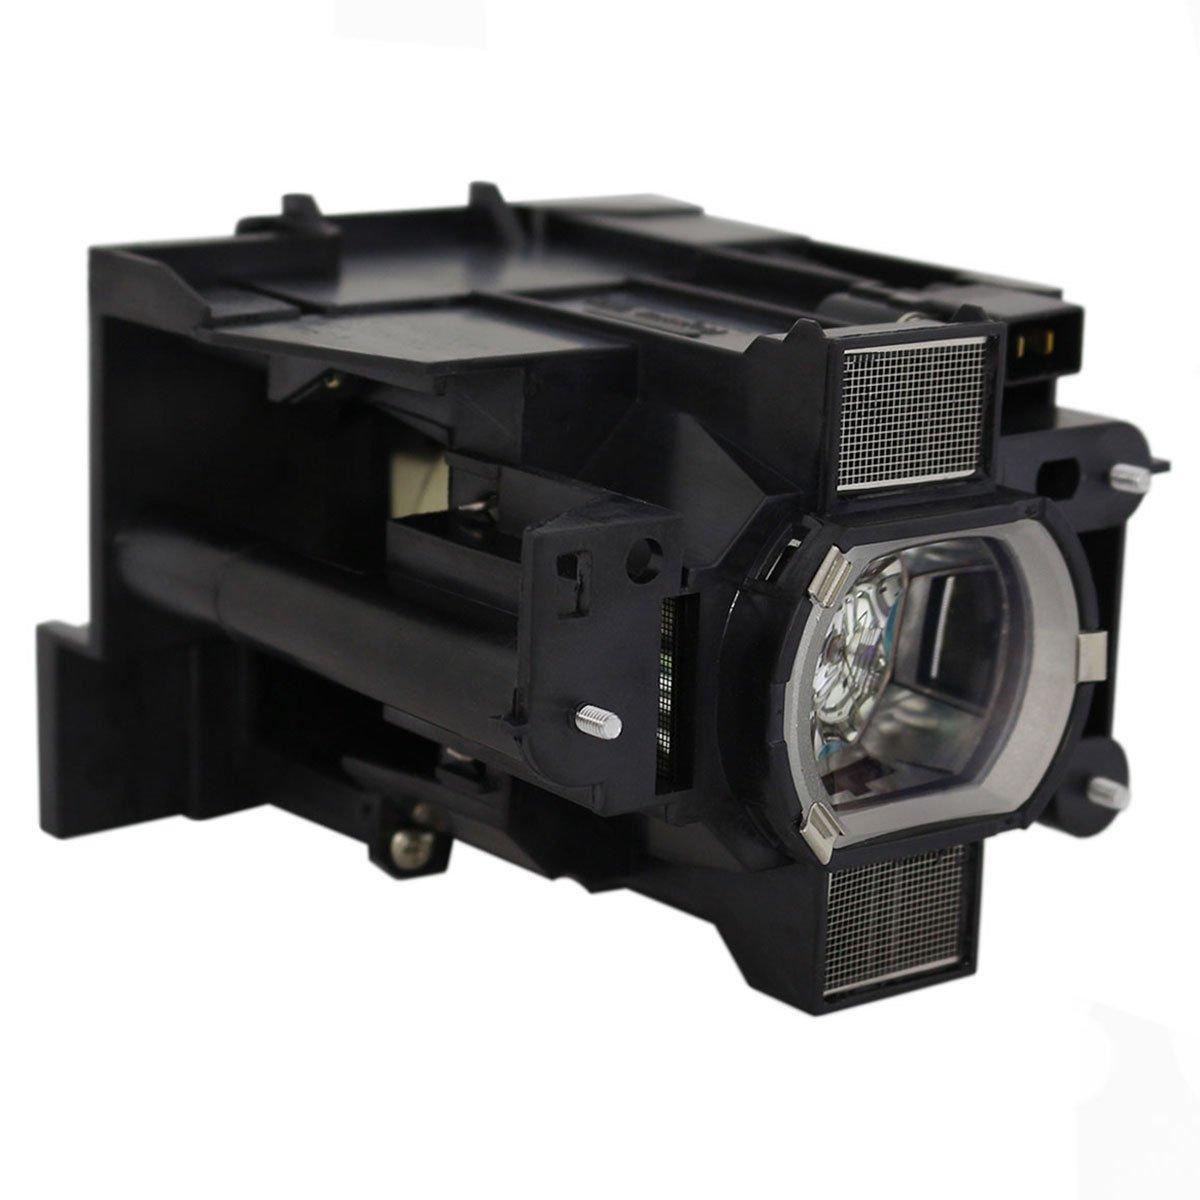 Supermait DT01291 プロジェクター交換用ランプ 汎用 150日間安心保証つき CP-WU8450 CP-WUX8450 CP-WX8255 CP-WX8255A CP-X816 対応 B0775FZPWM